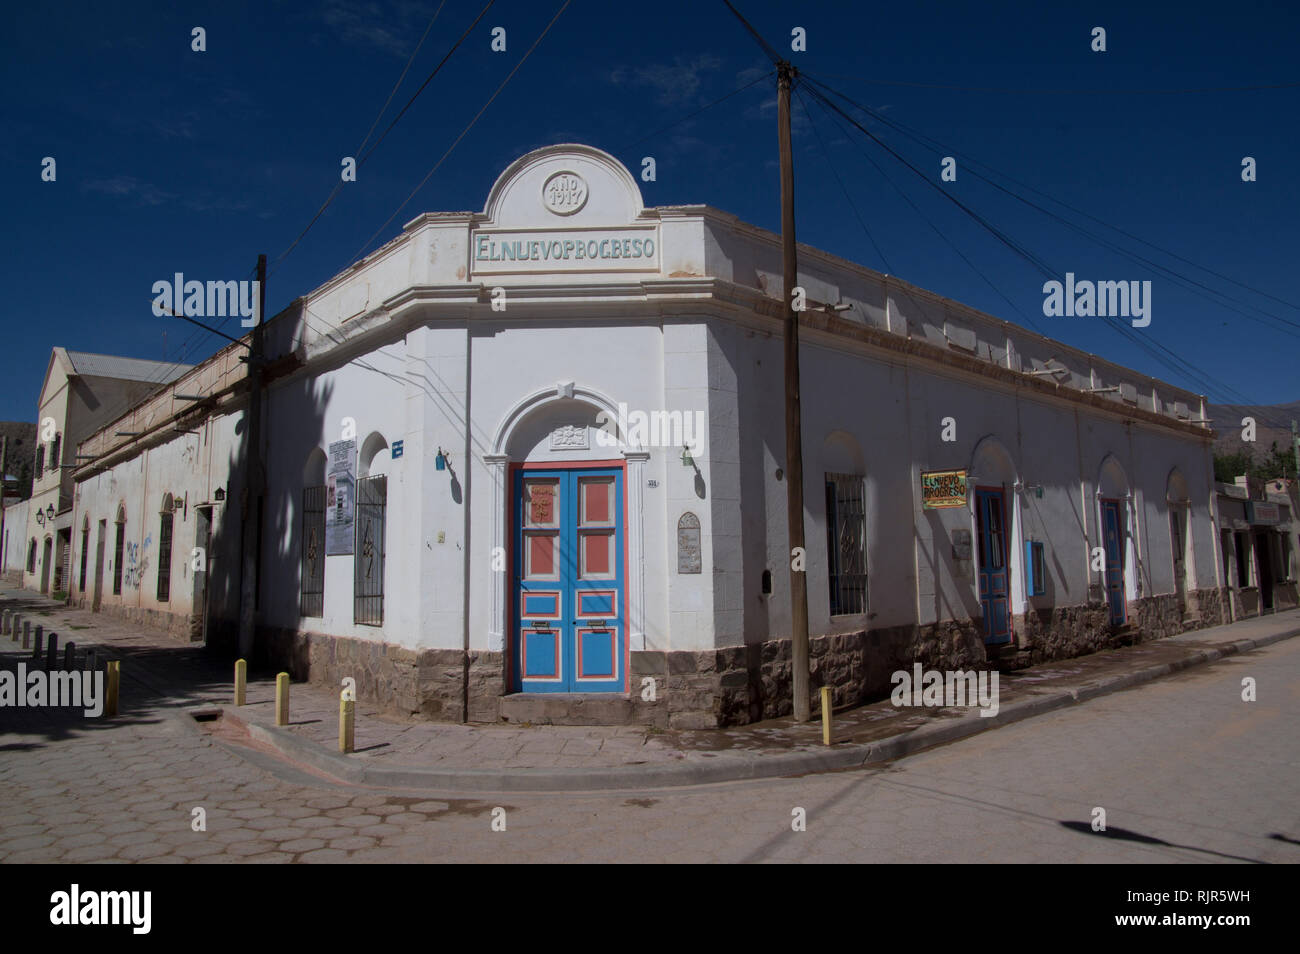 Nuevo Progreso Stock Photos & Nuevo Progreso Stock Images - Alamy